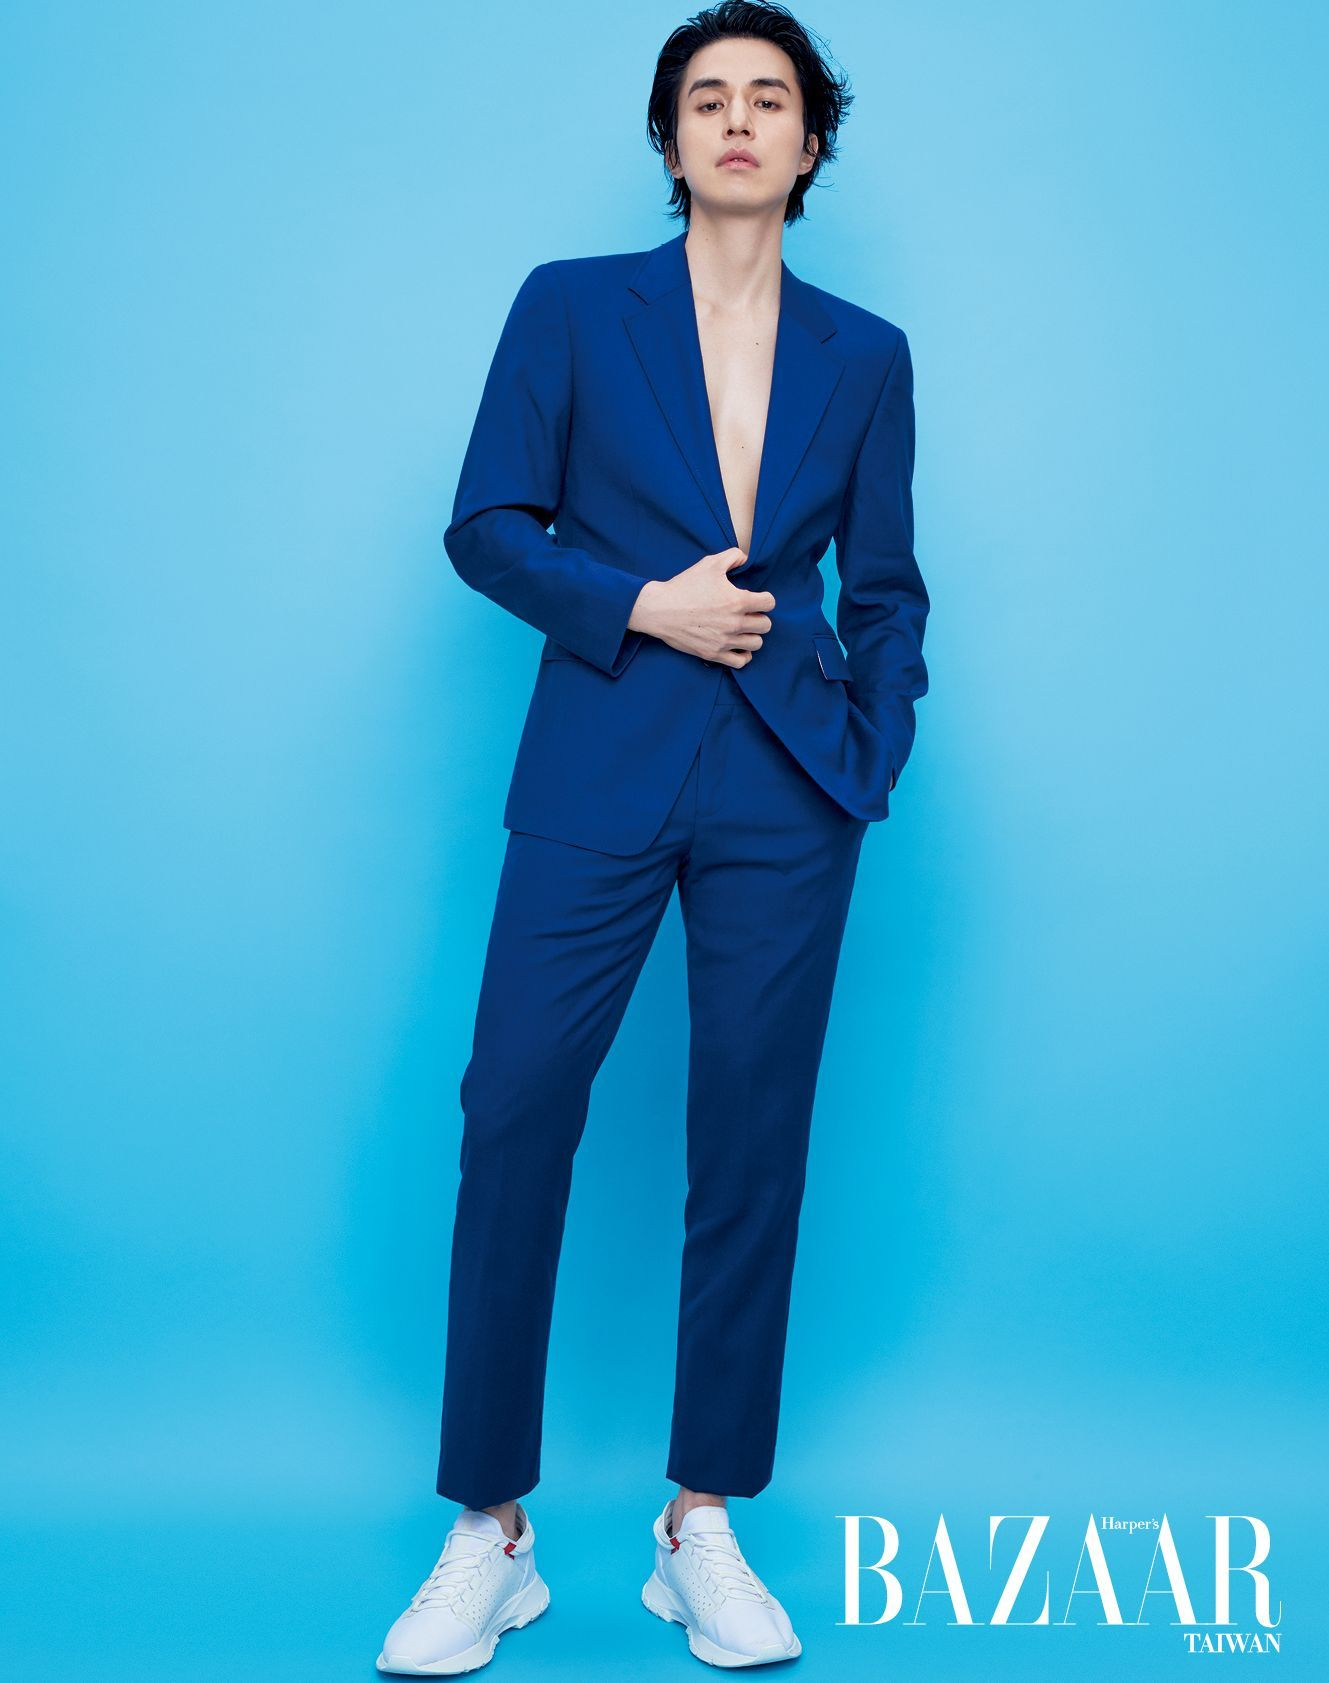 Lee Dong Wook Para Harper S Bazaar Man Vietnam Marzo 2020 En 2020 Lee Dong Wook Actores Coreanos Actores